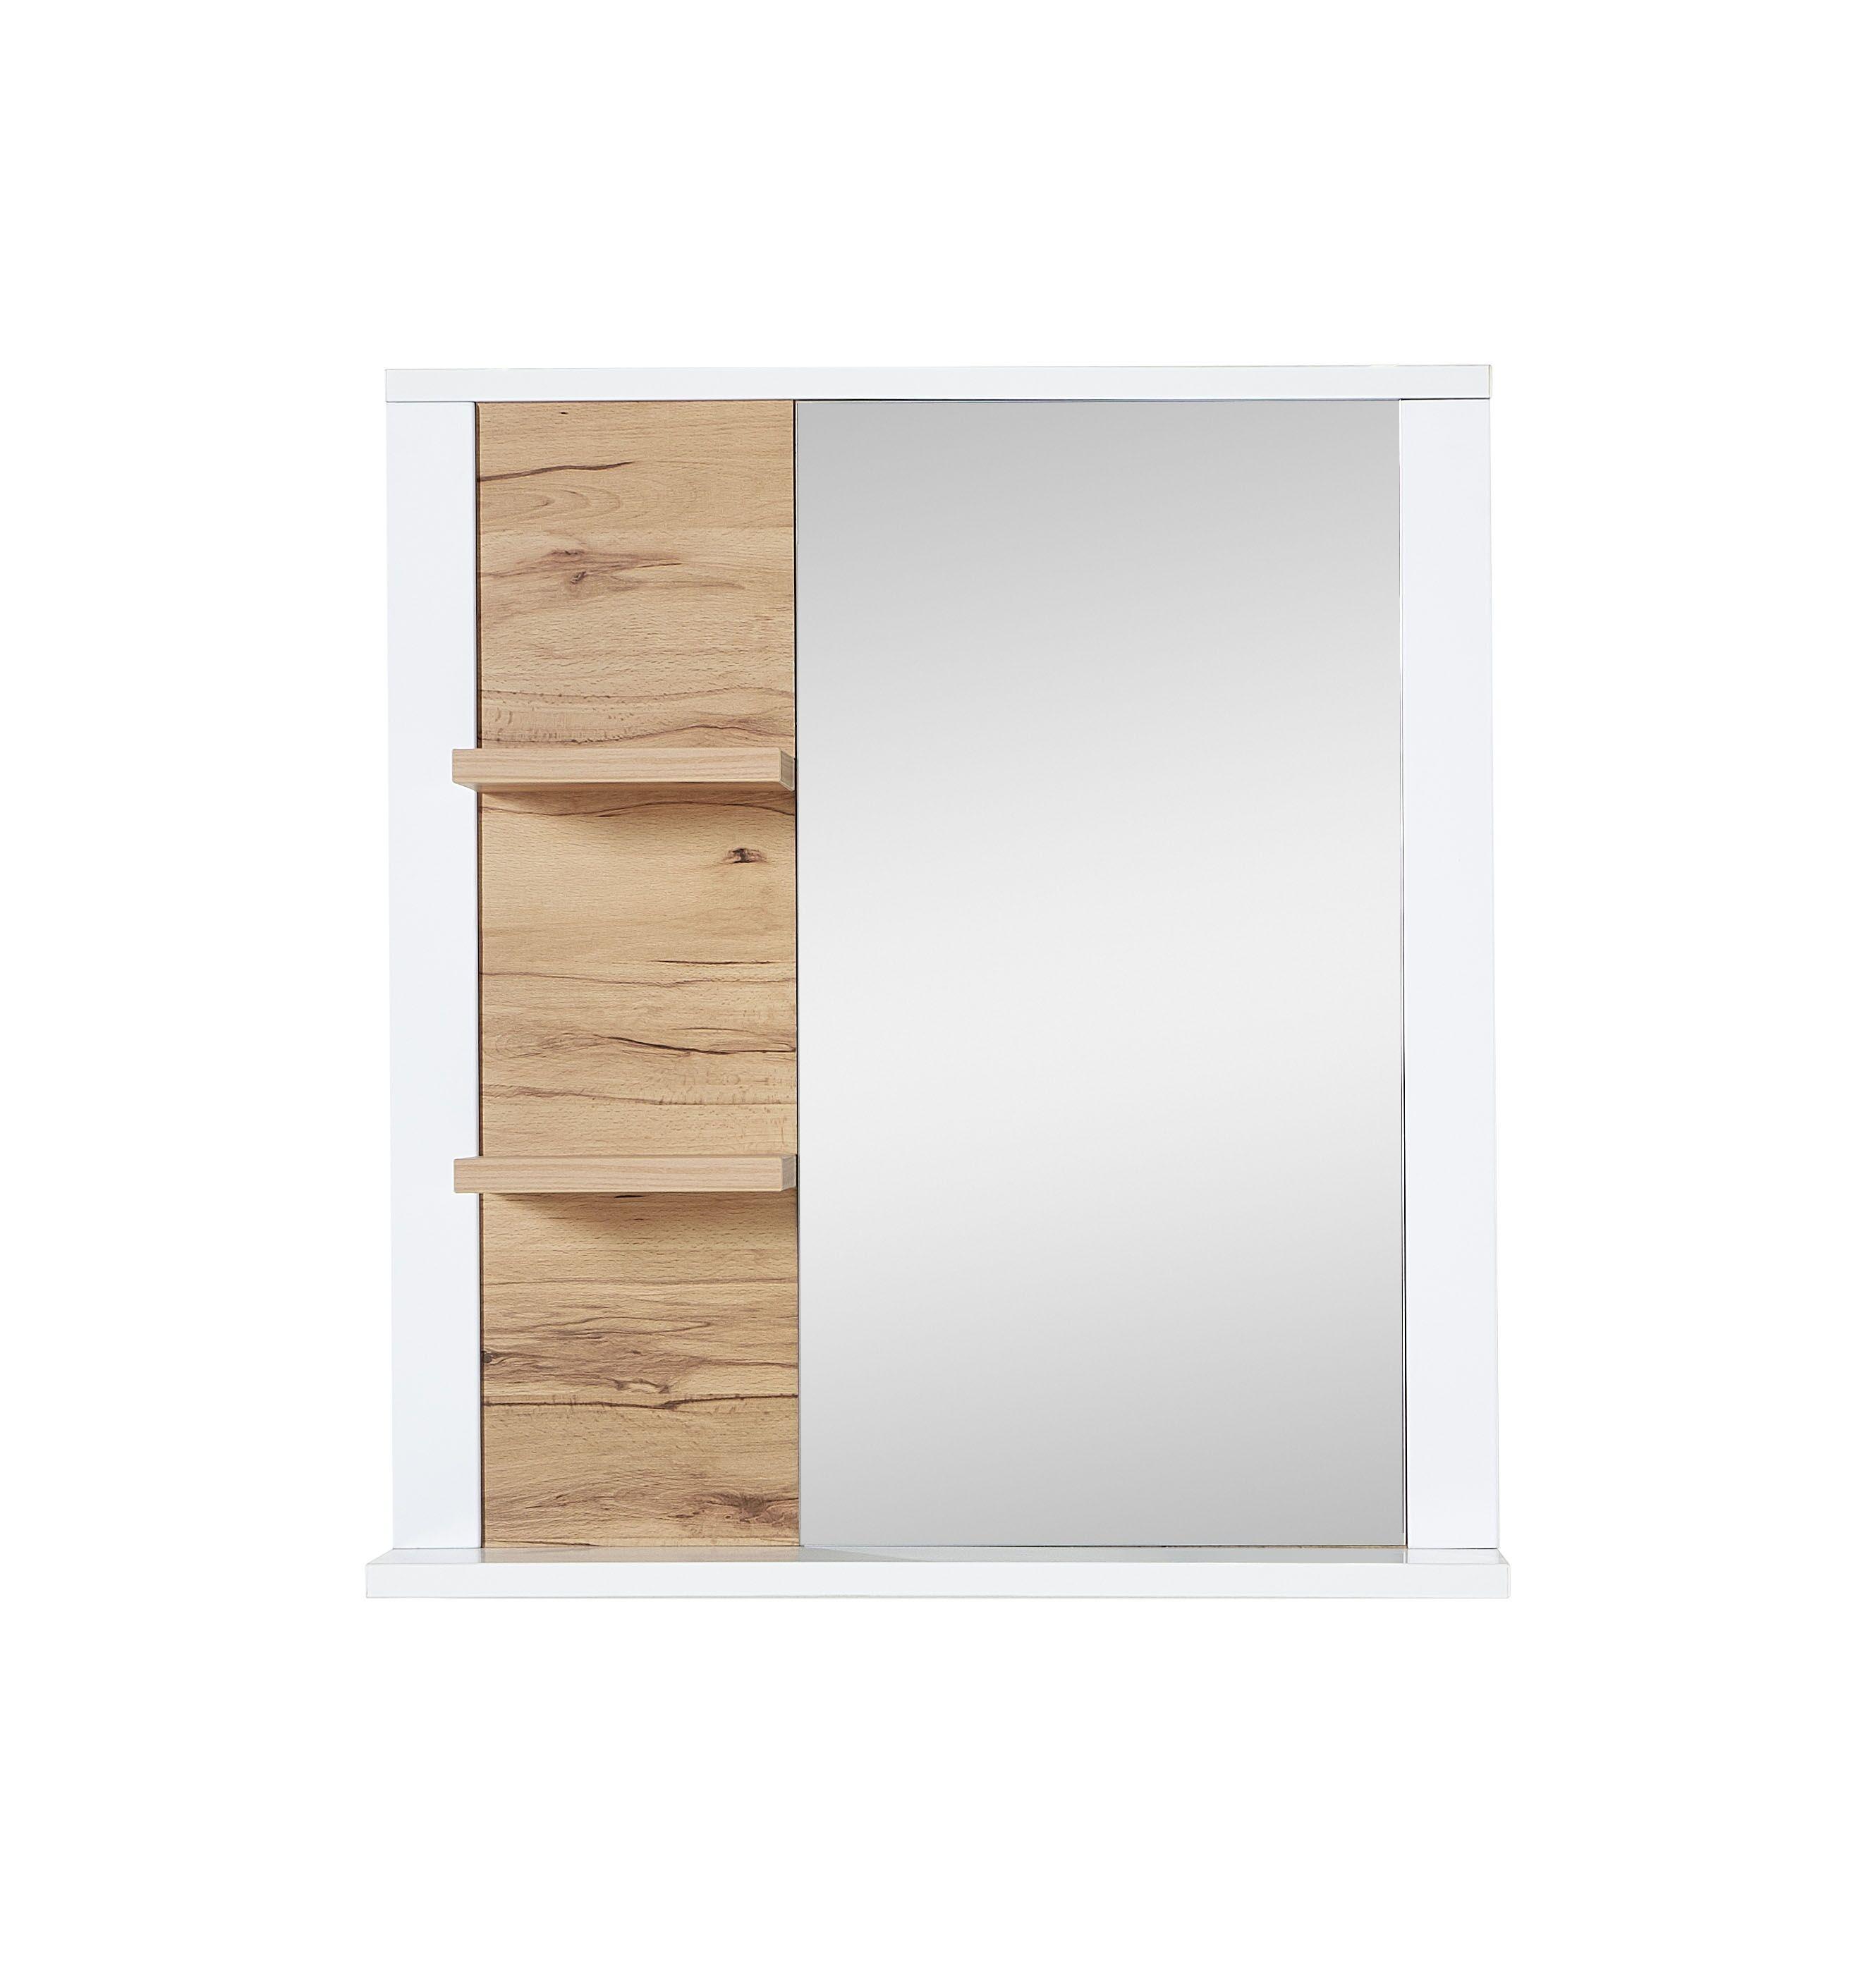 Oglinda decorativa cu 2 etajere din pal si MDF, Selina Alb / Natur, l73xA15xH80 cm imagine